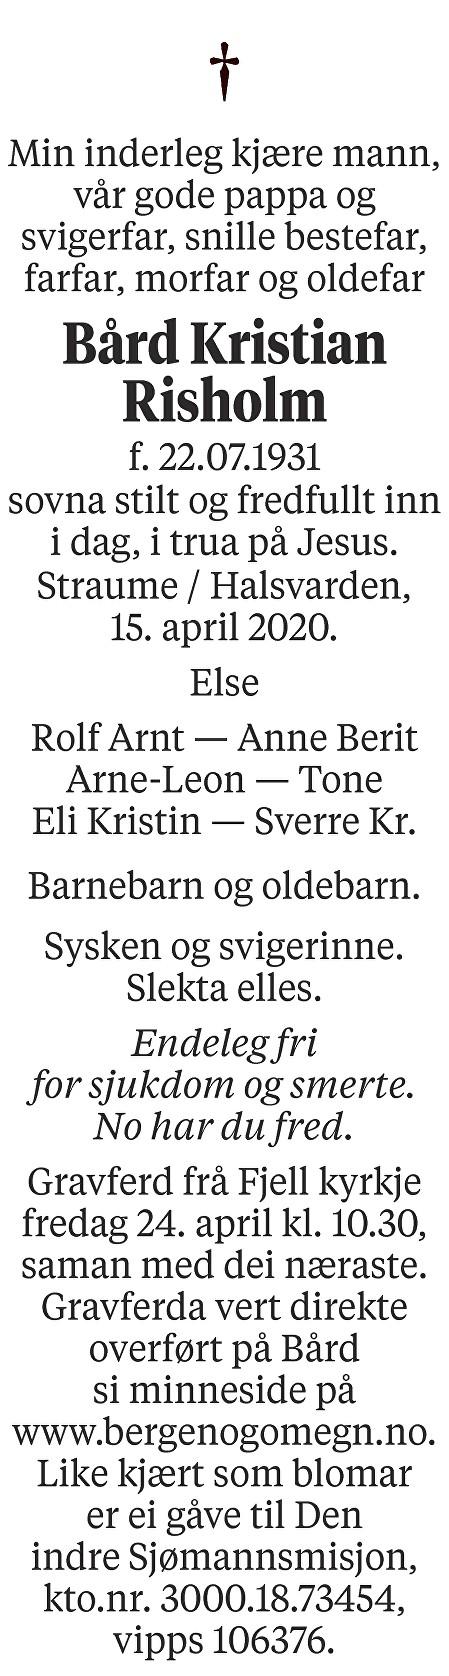 Bård Kristian Risholm Dødsannonse